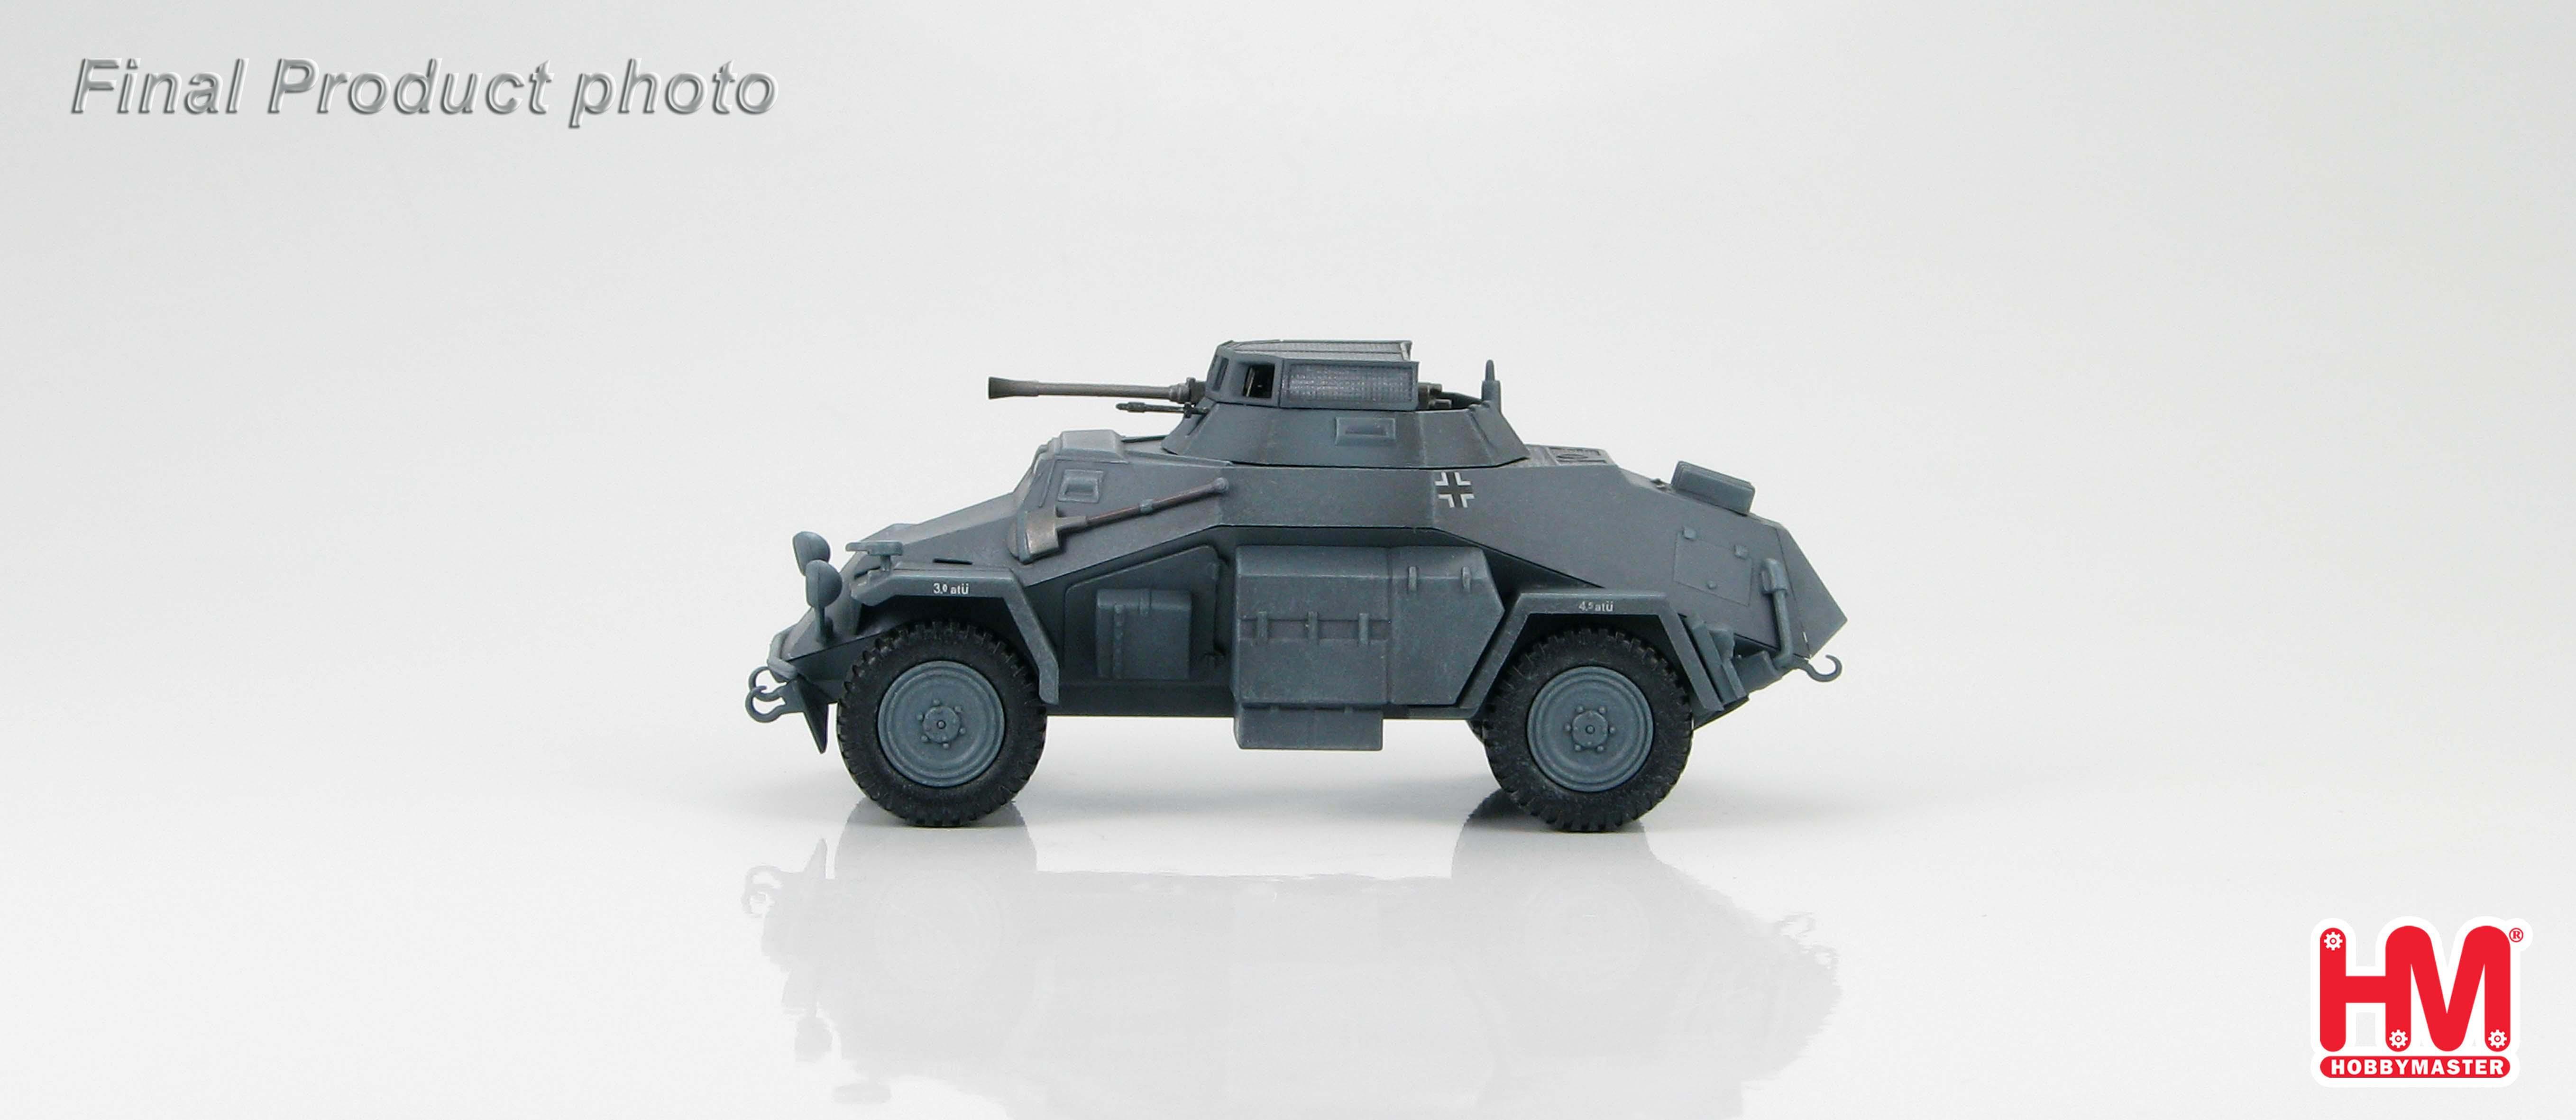 hg1401 hobbymaster sdkfz 222 leichter panzerspahwagen. Black Bedroom Furniture Sets. Home Design Ideas